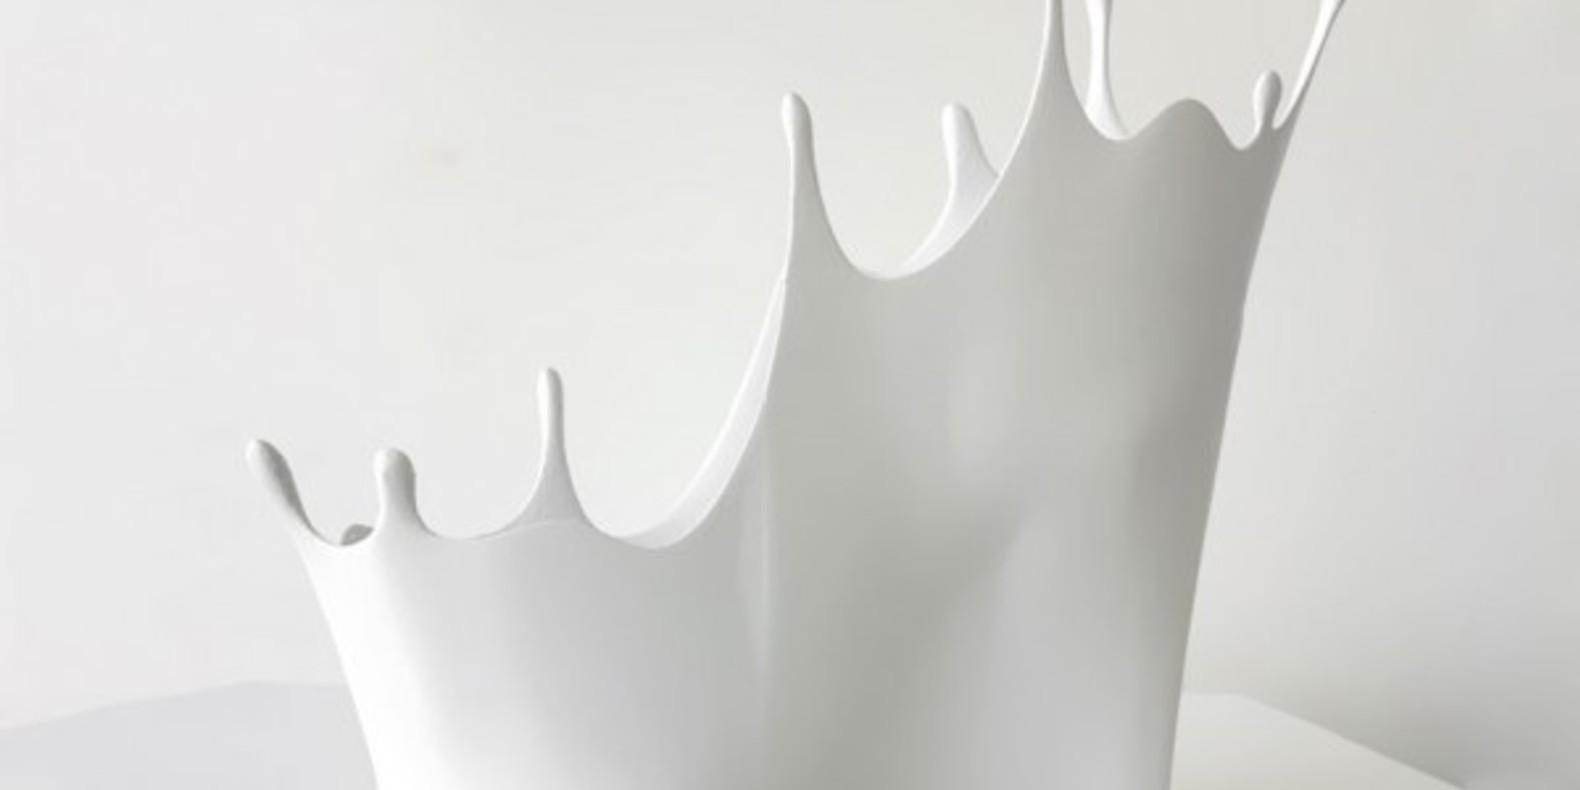 sebastian errazuriz shoe 3D print cults chaussures imprimees en 3D makerbot melissa designer 3D 5